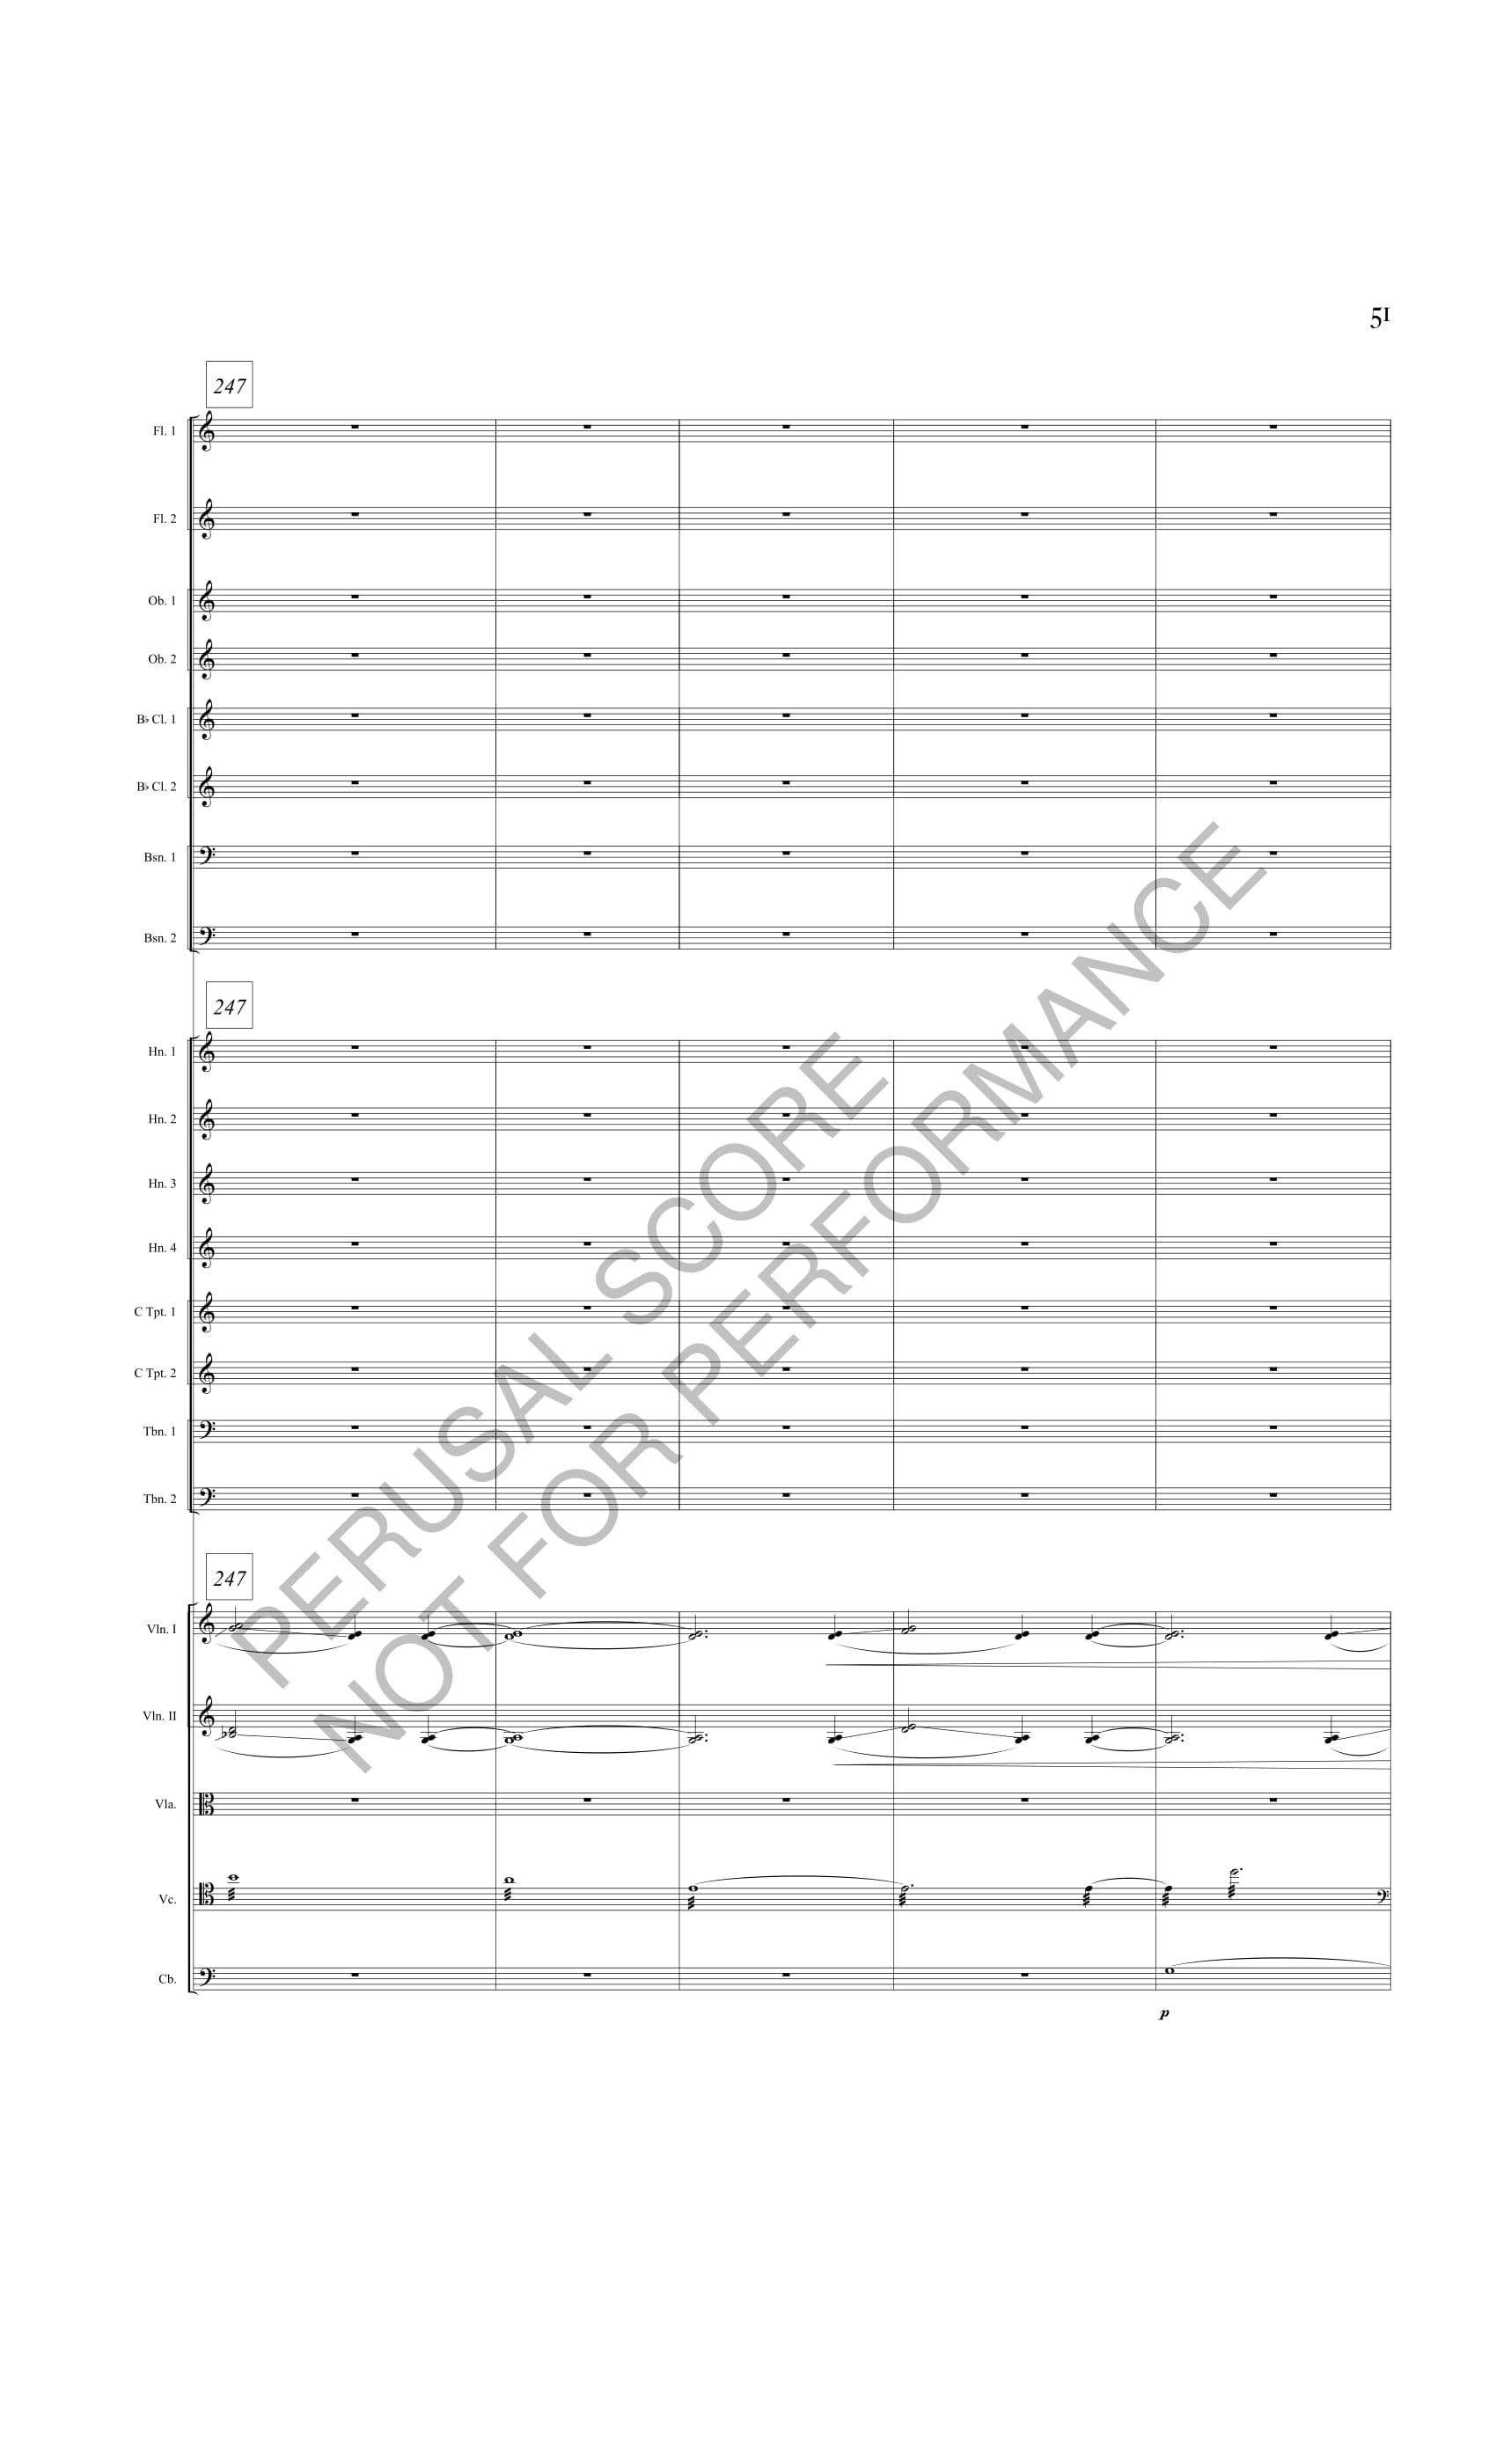 Boyd Ondine Score-watermark (3)-57.jpg